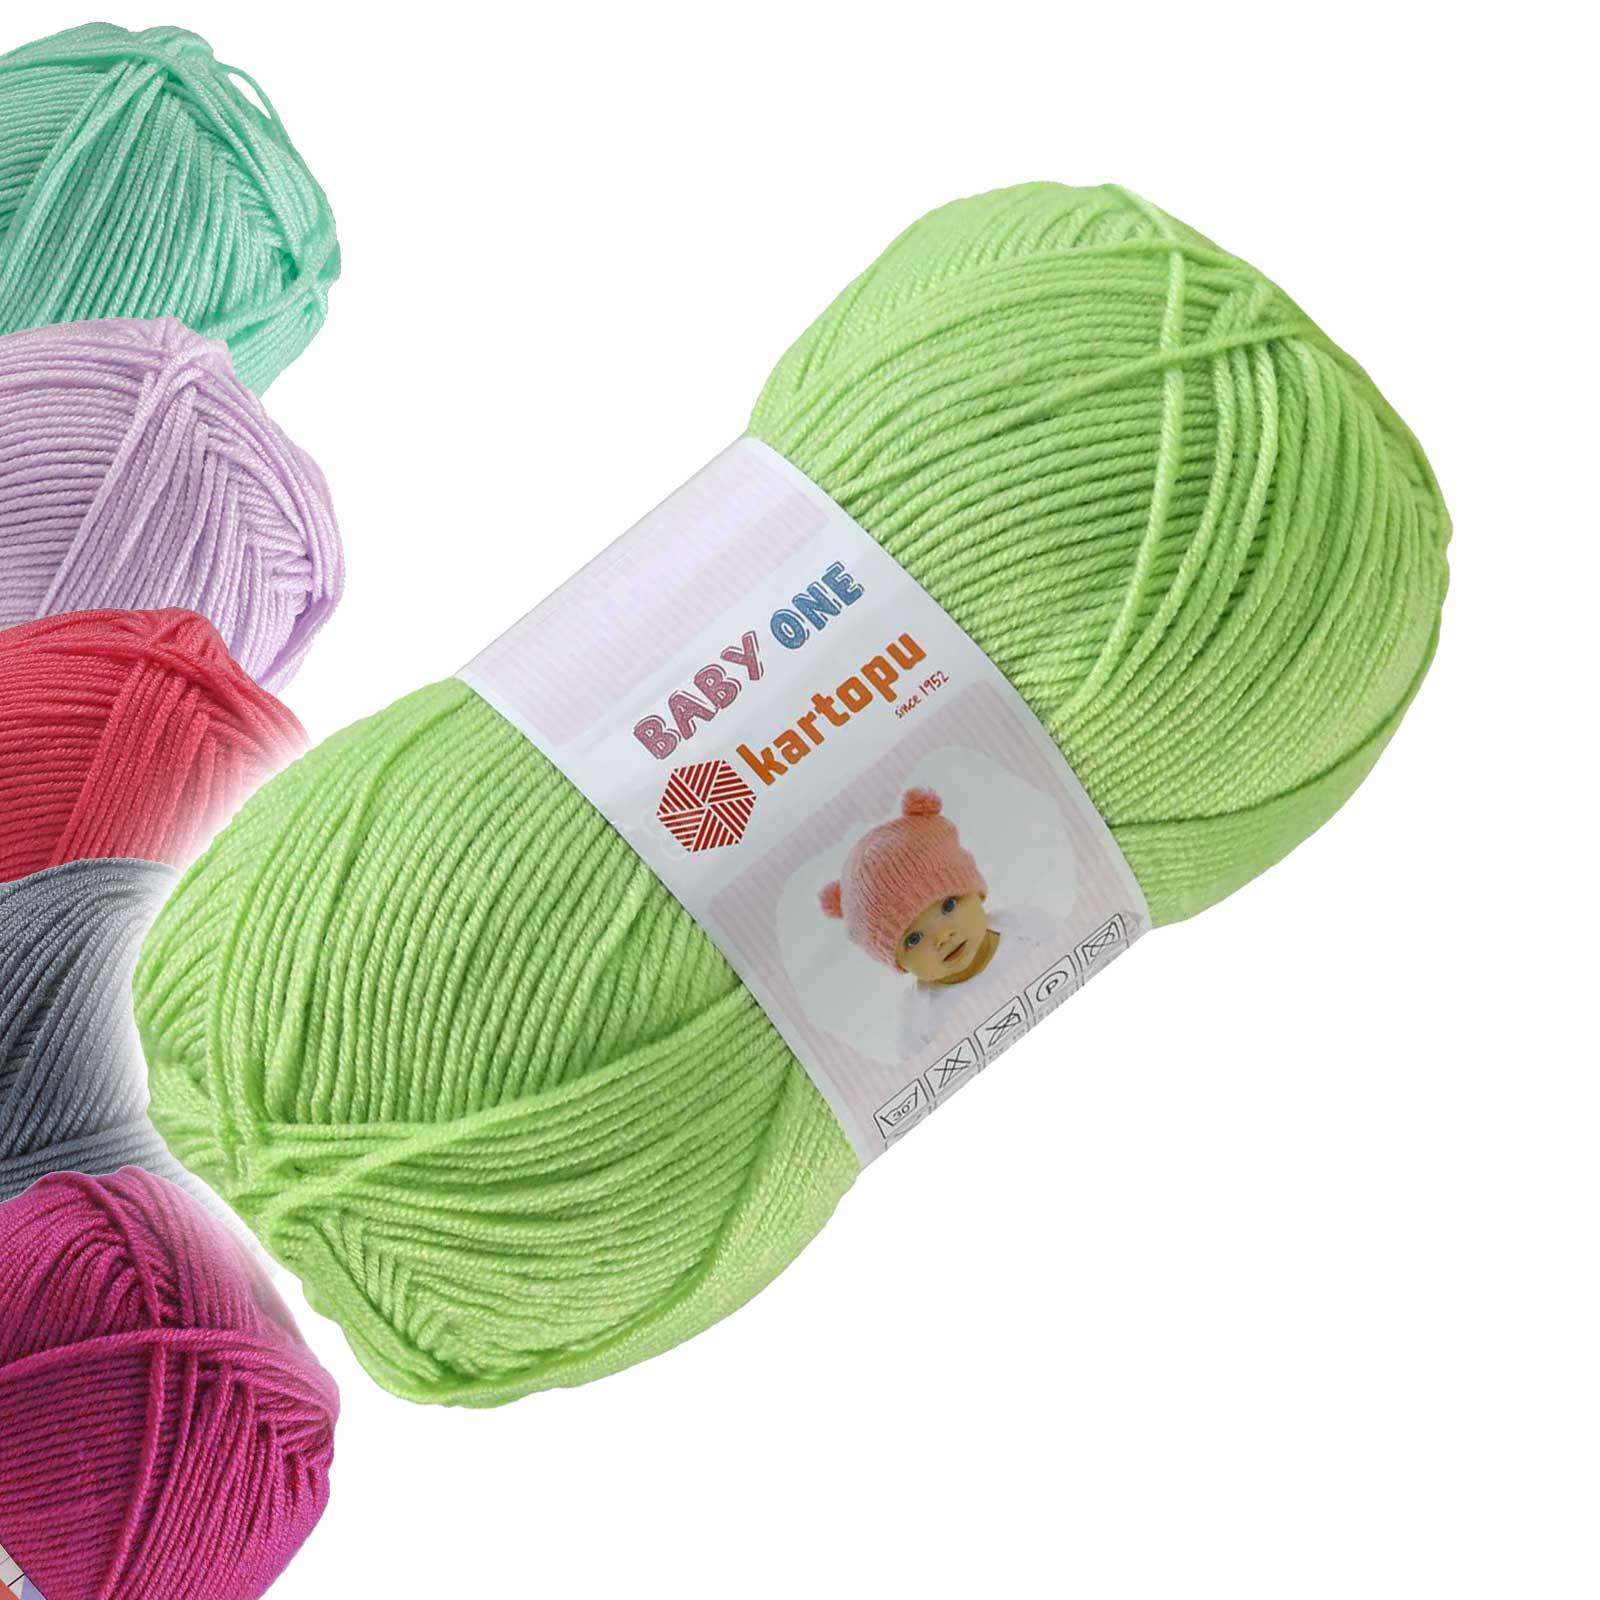 100g Strickgarn Kartopu BABY ONE Antipilling Babywolle Babystrickgarn, Farbwahl – Bild 19